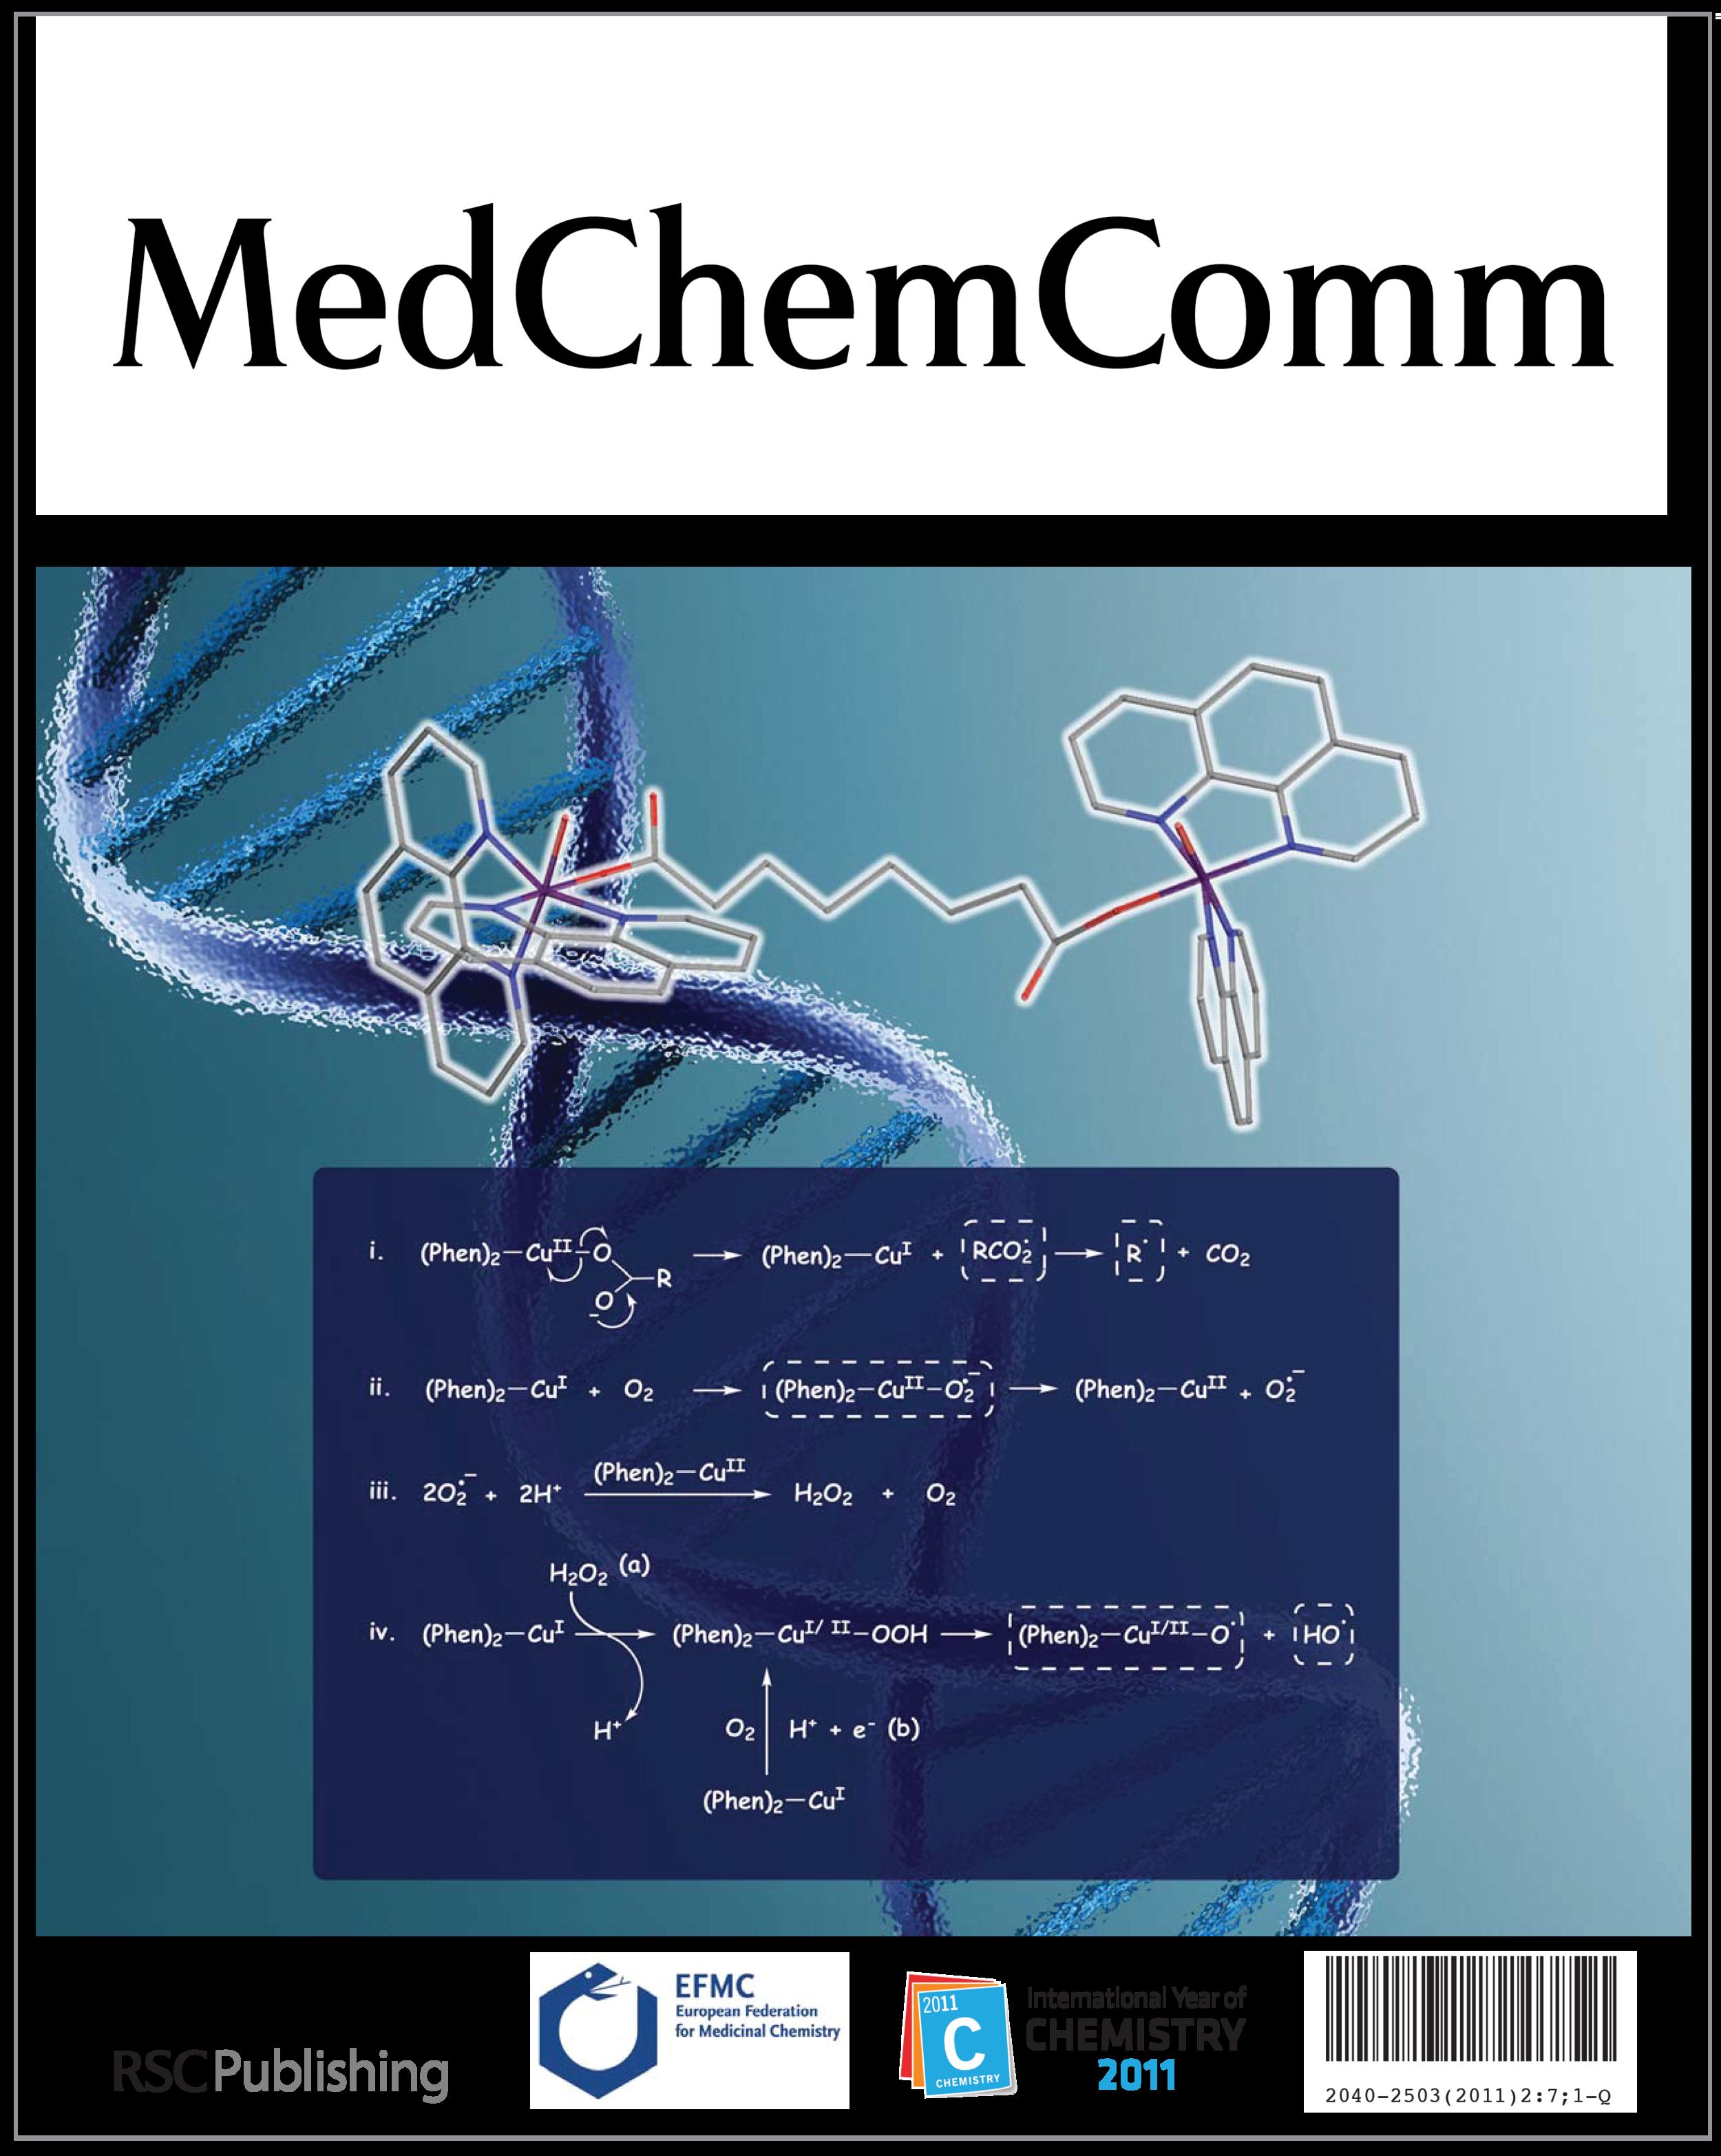 MedChemComm-01.png